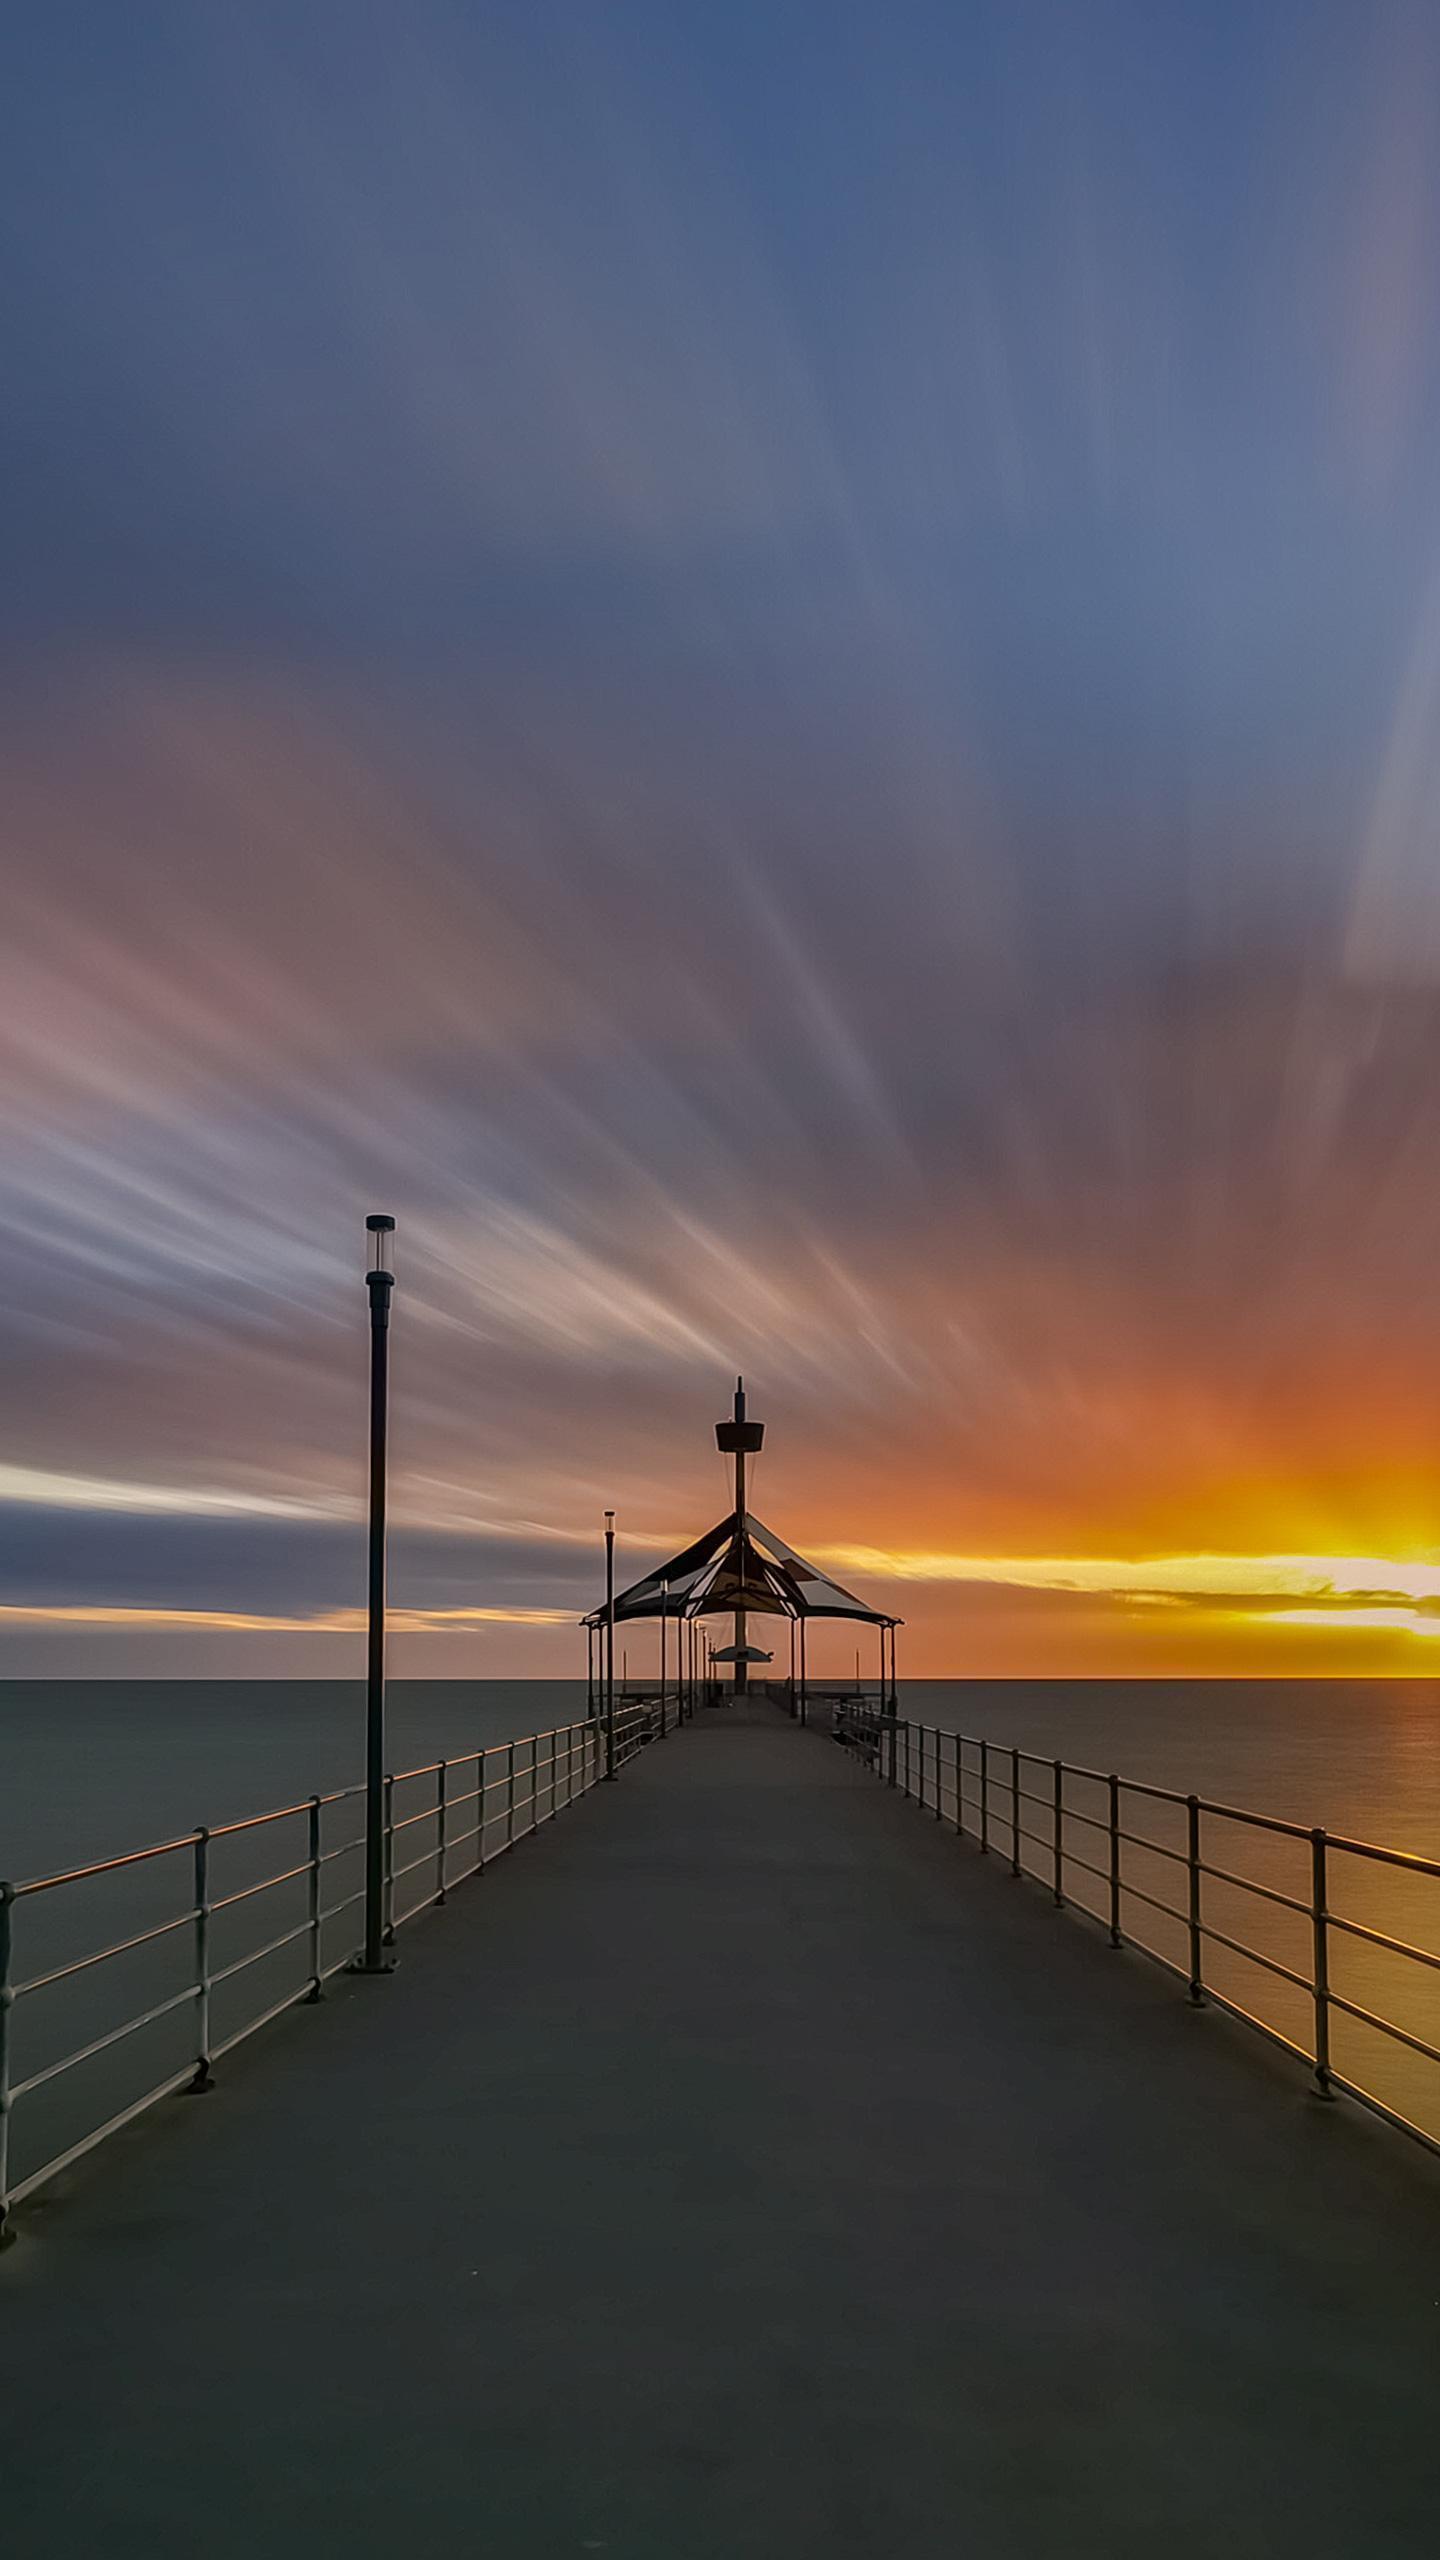 Breeze Bay. Located on the southern coast of Kangaroo Island, Australia, it is a beautiful world.